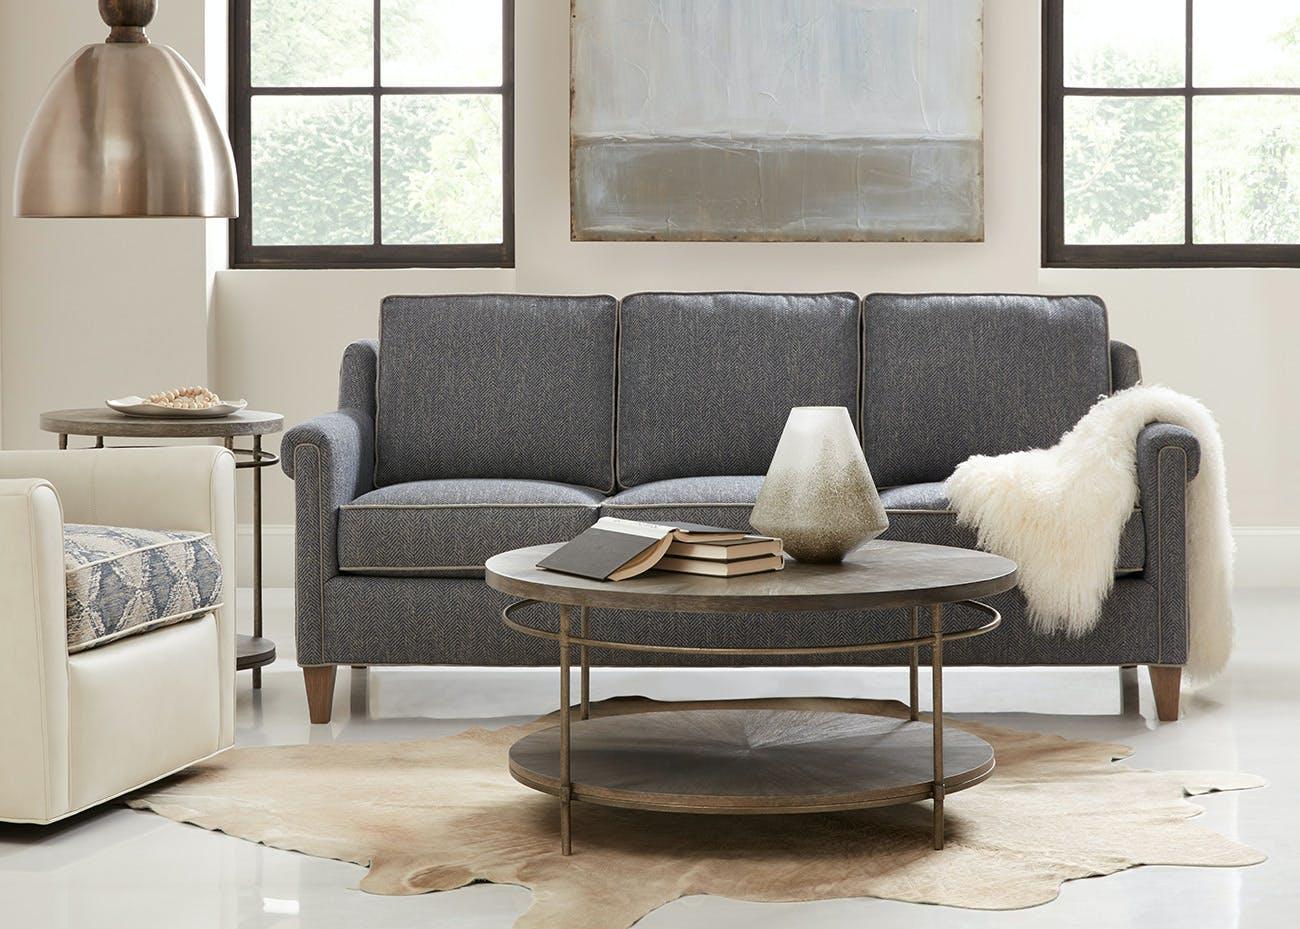 luxurious leather furniture bradington young rh bradington young com bradington young newman reclining sofa bradington young reclining sofa reviews